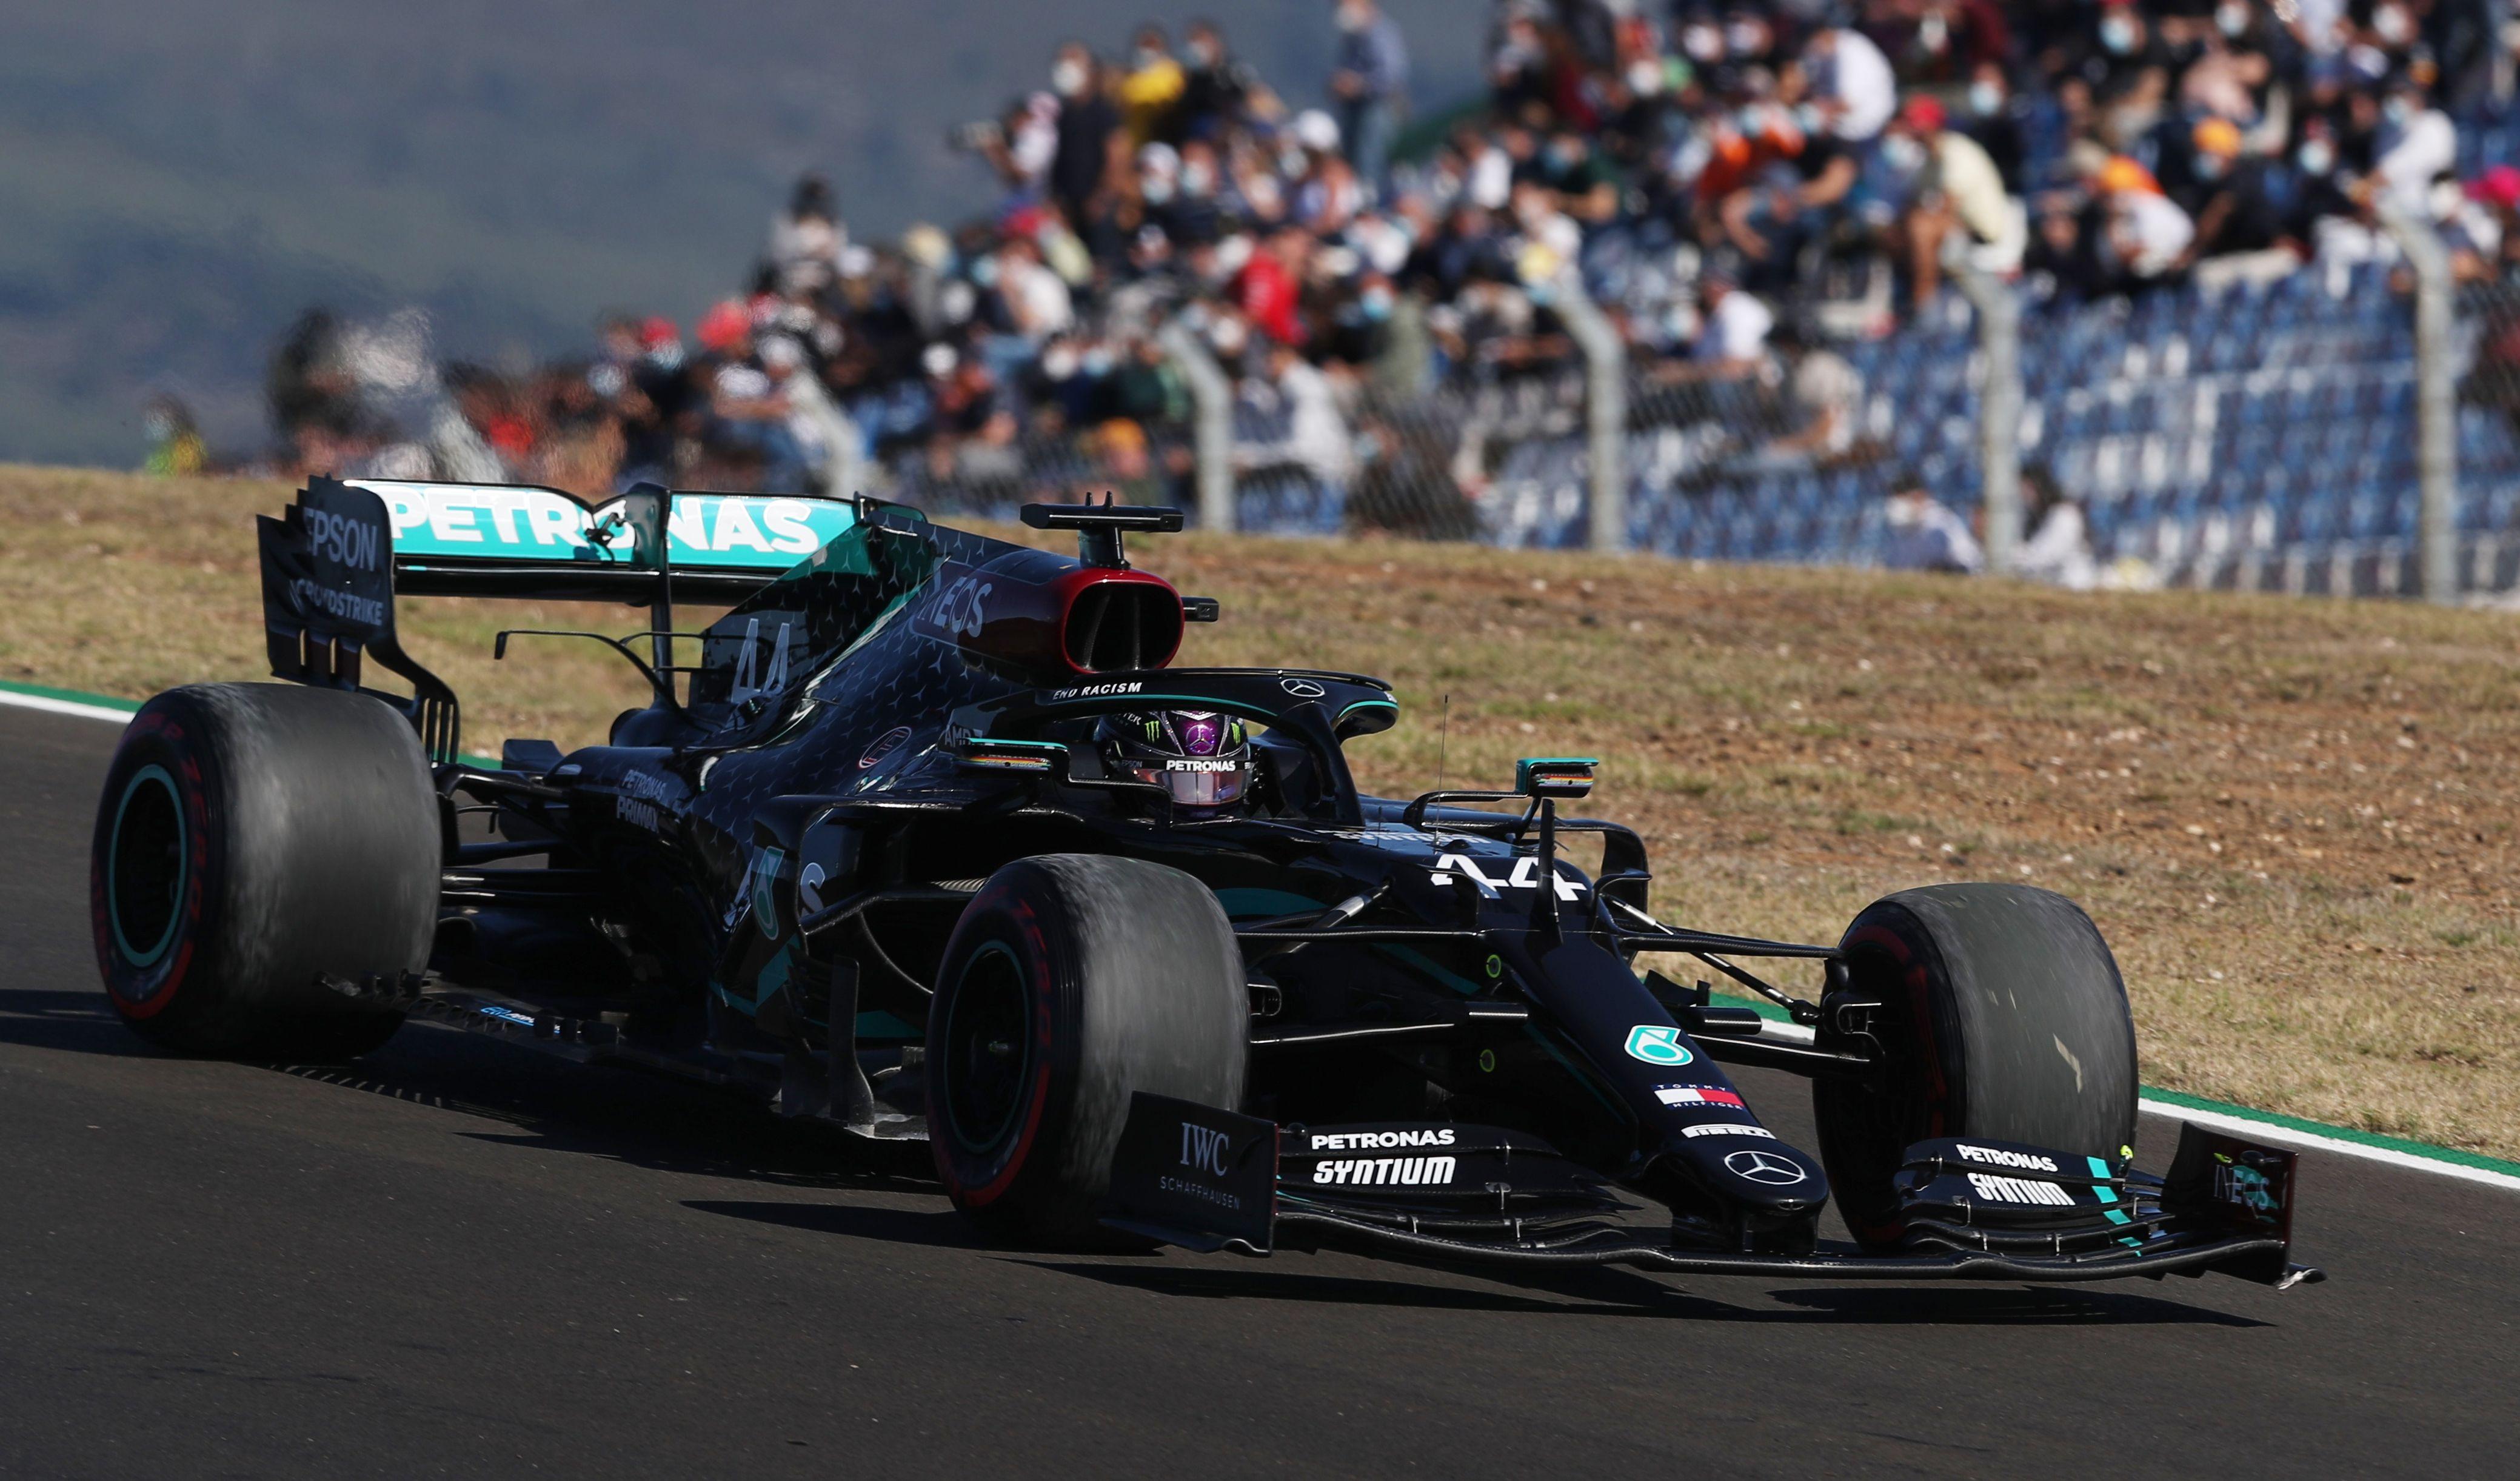 GP du Portugal : Hamilton confisque (encore) la pole